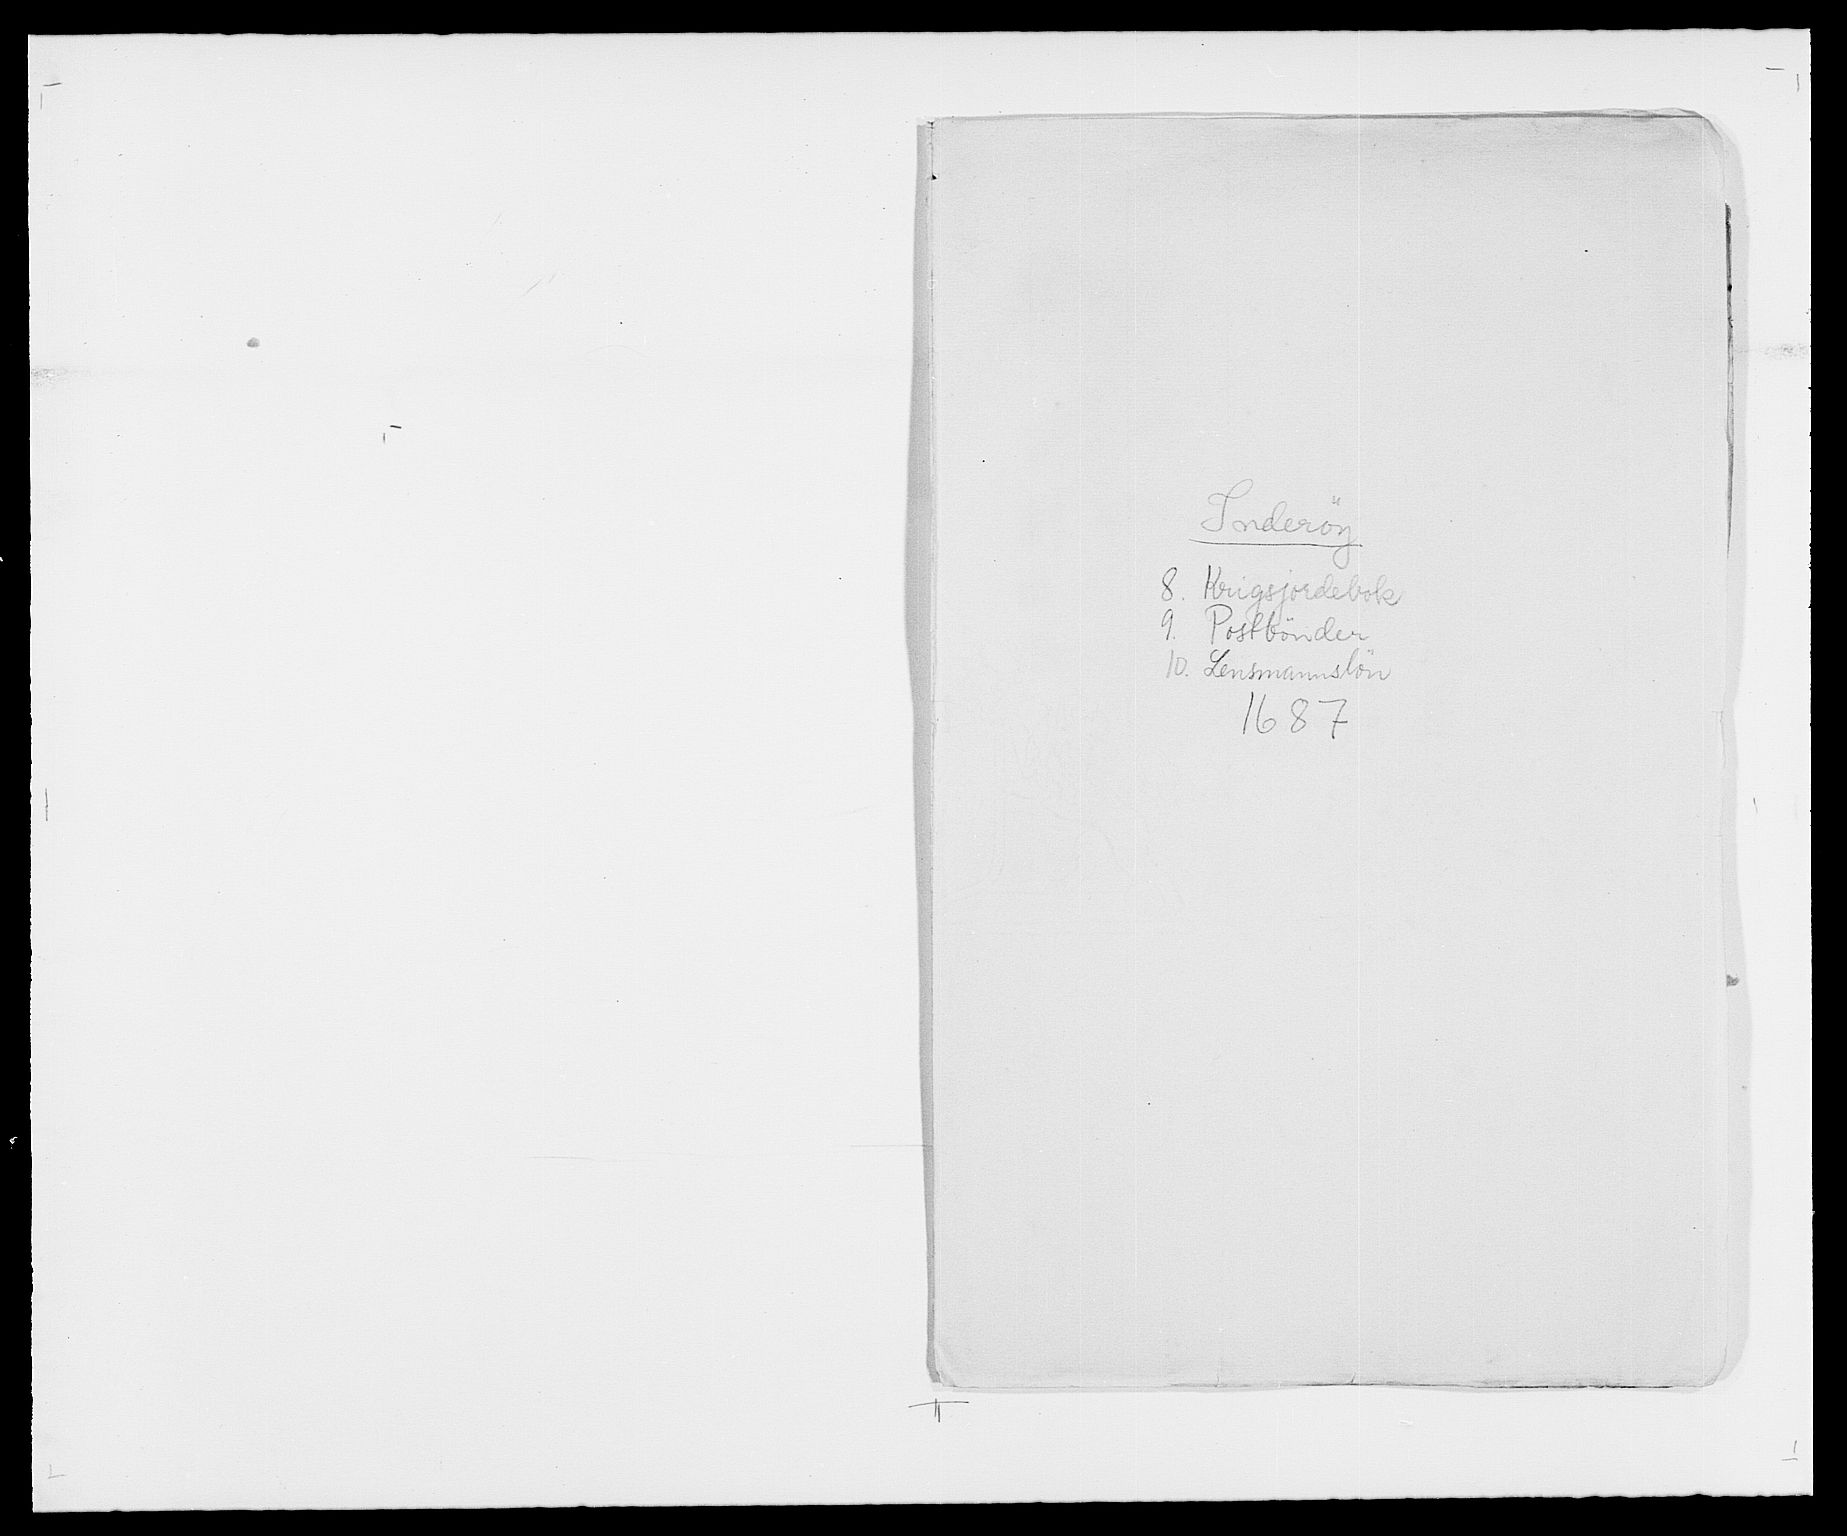 RA, Rentekammeret inntil 1814, Reviderte regnskaper, Fogderegnskap, R63/L4306: Fogderegnskap Inderøy, 1687-1689, s. 213